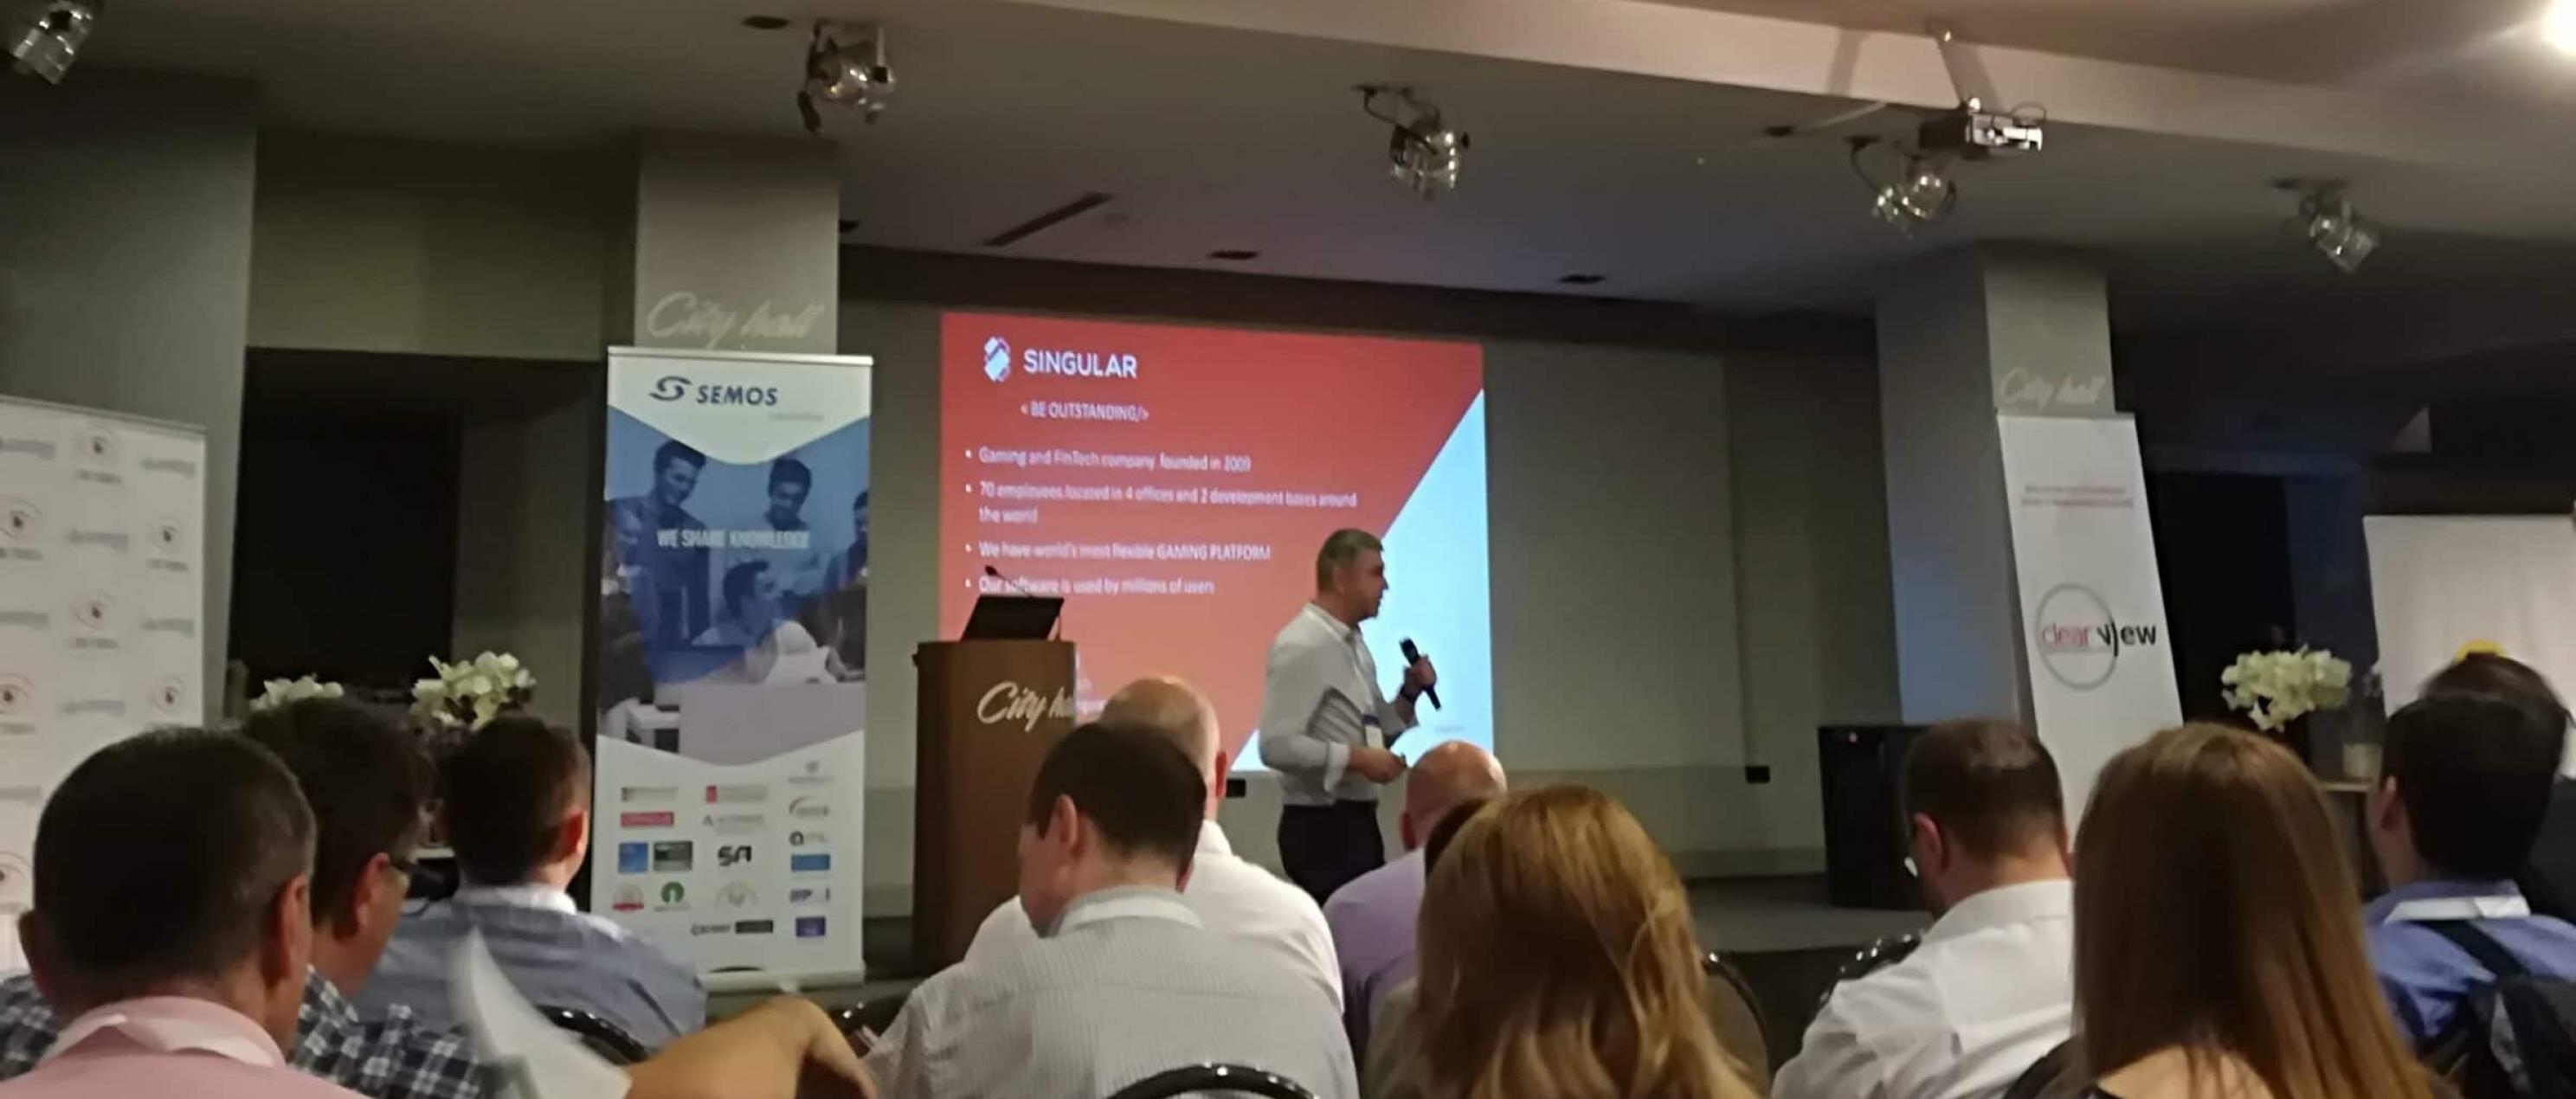 Singular at IT conference